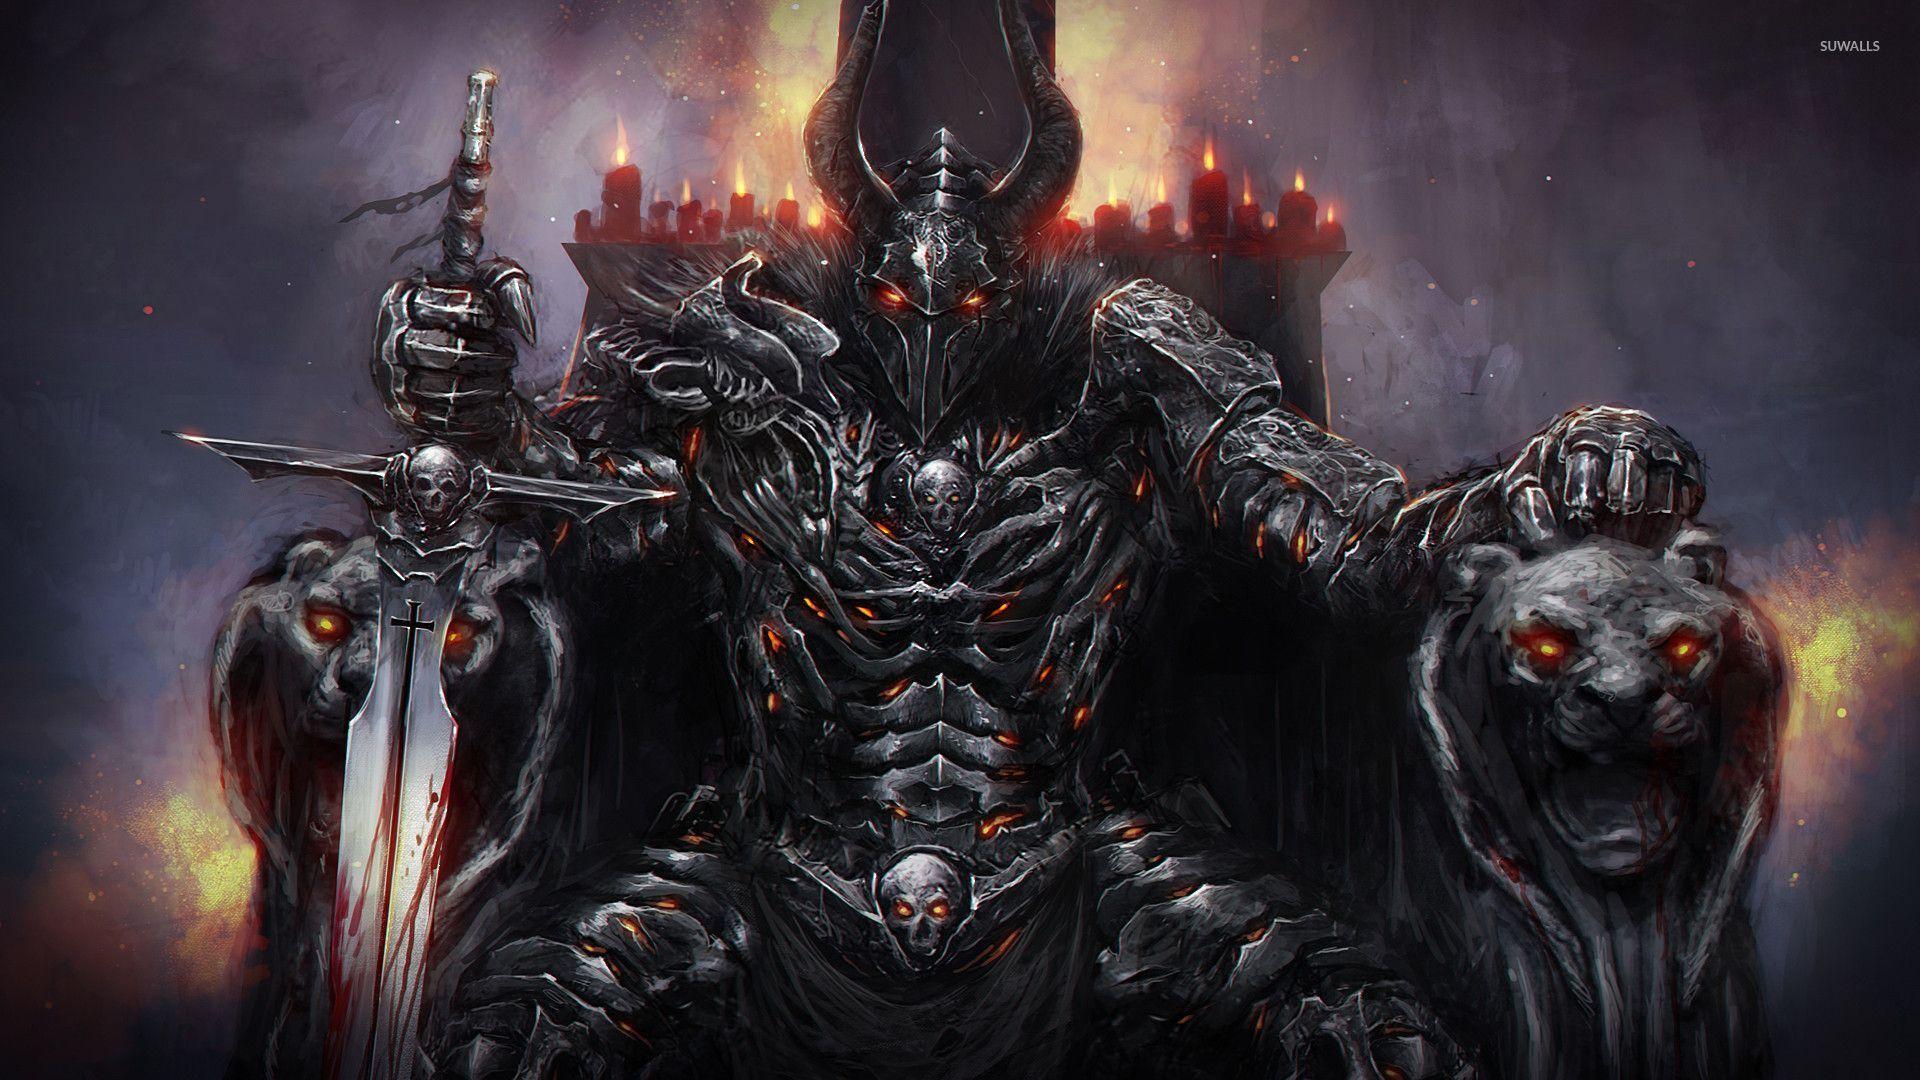 monster king wallpaper fantasy wallpapers 31196